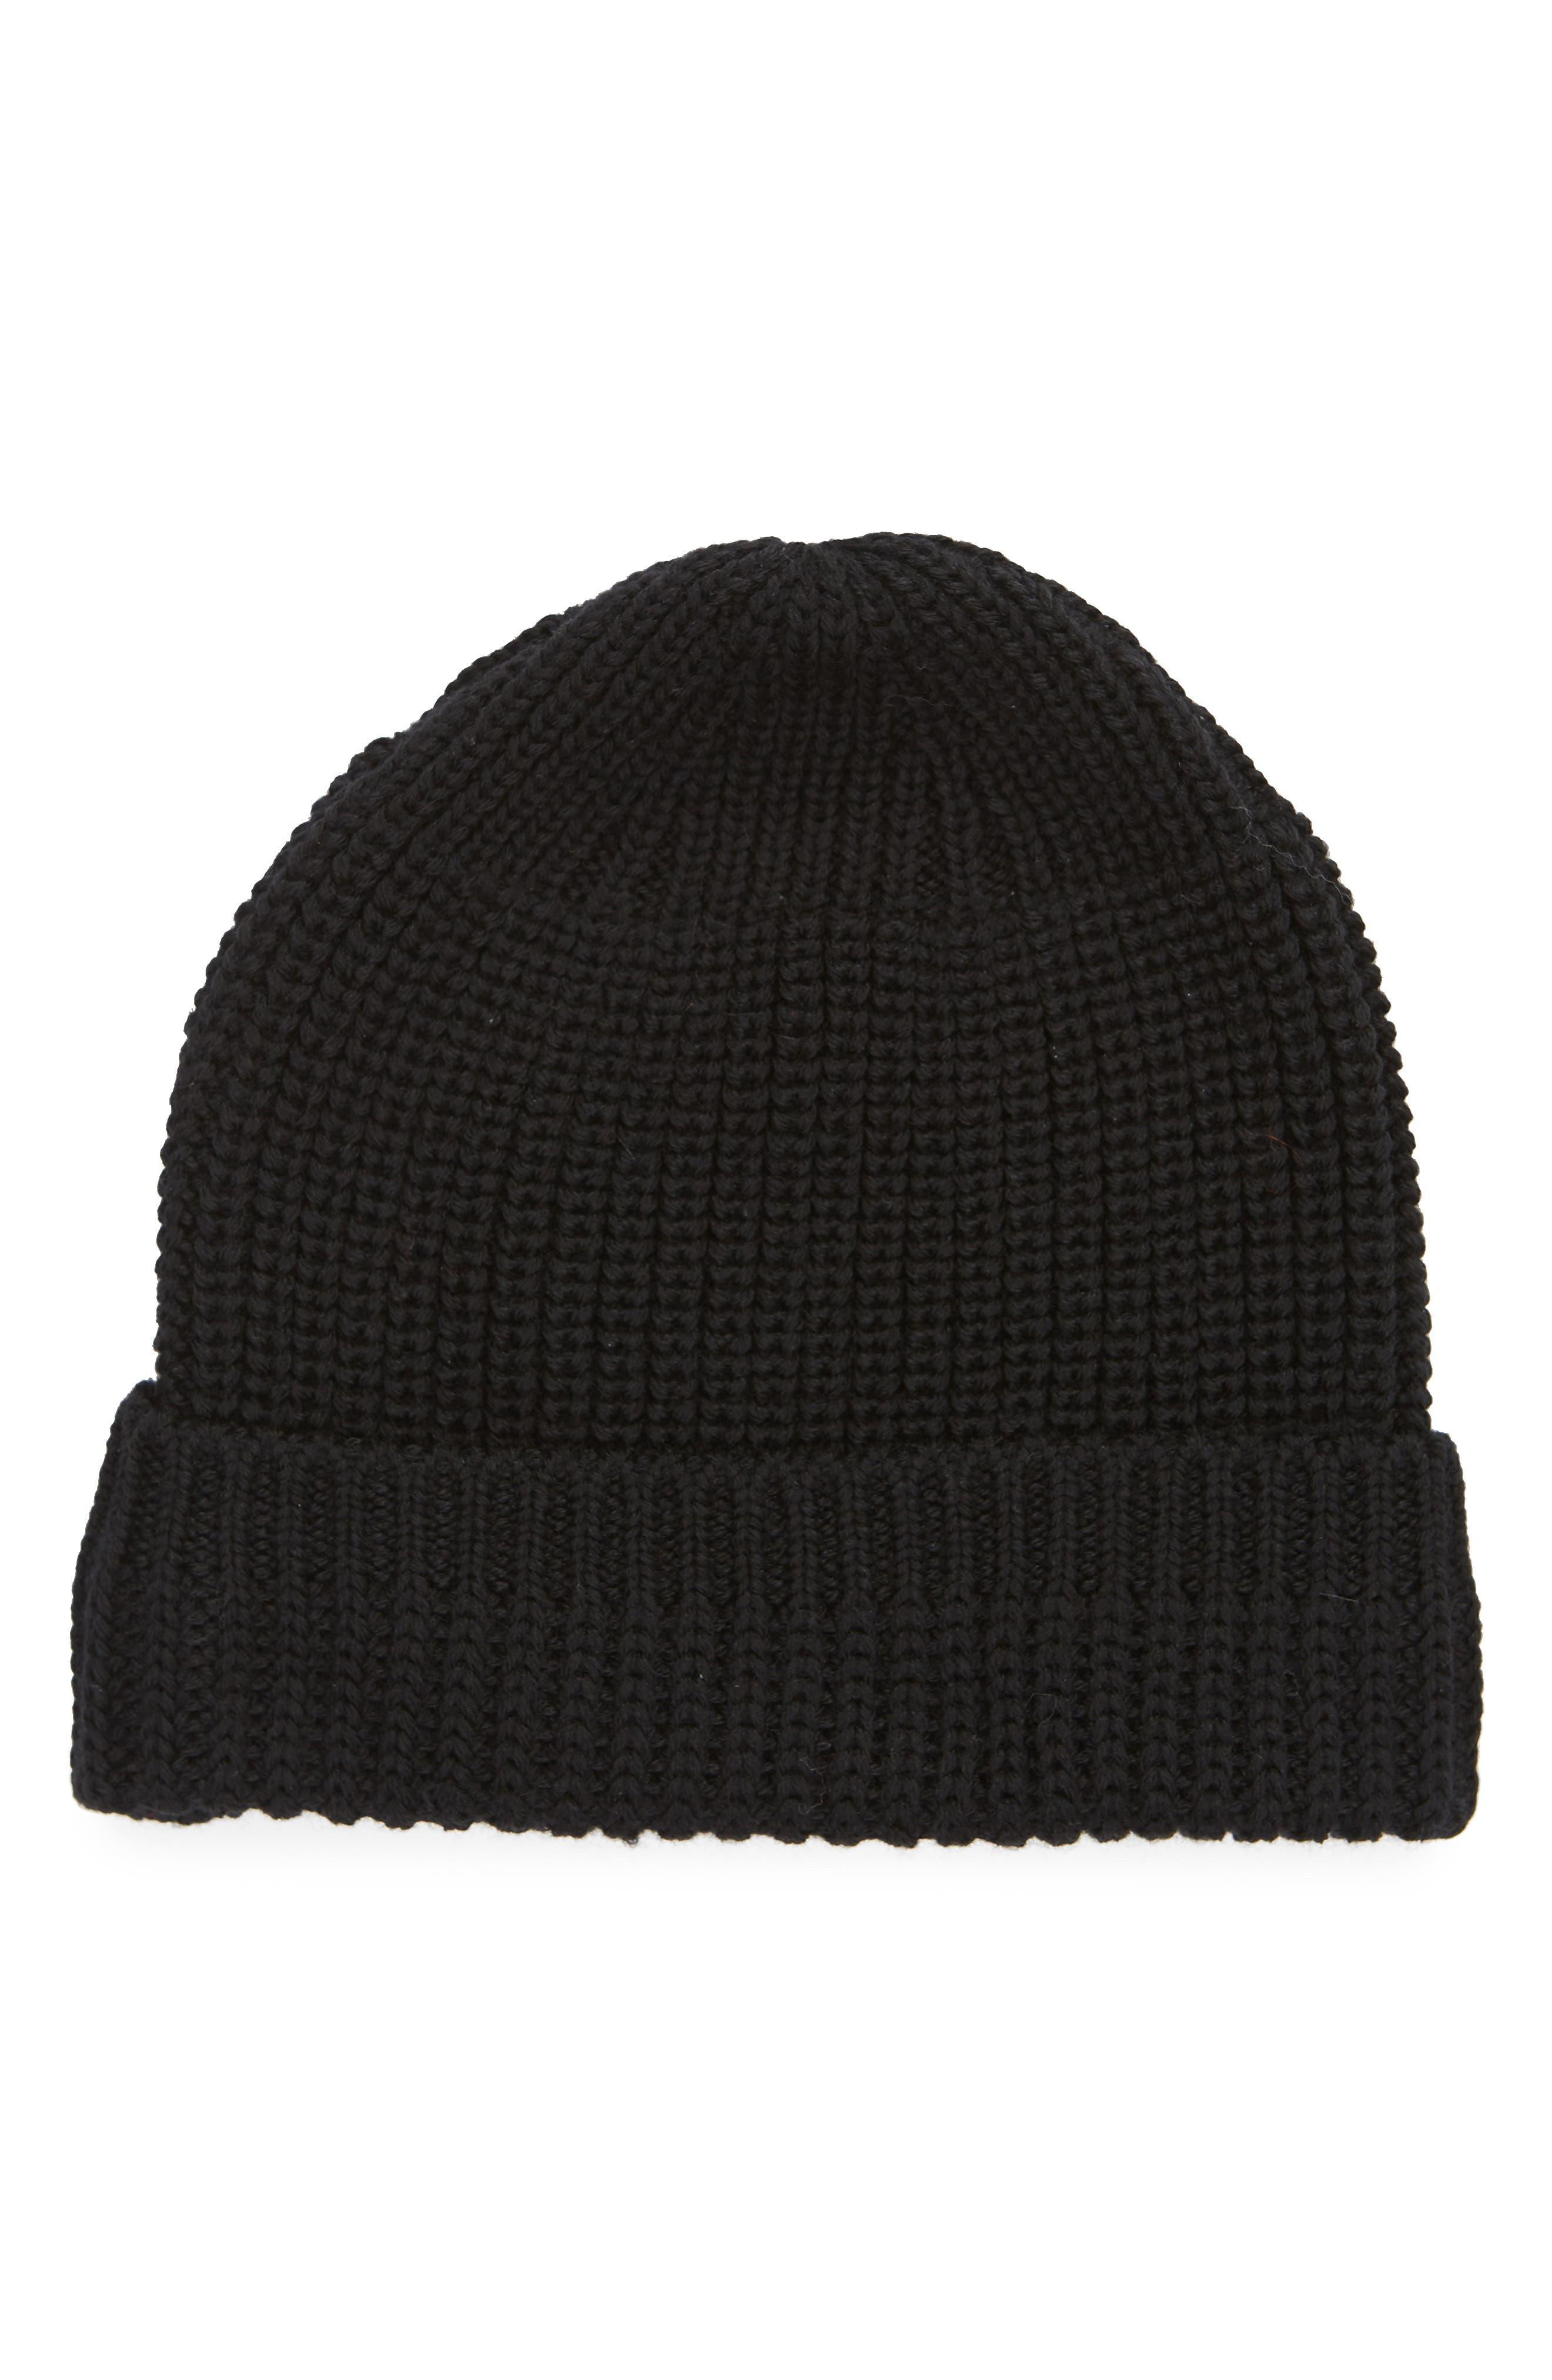 Knit Wool Beanie,                         Main,                         color, BLACK